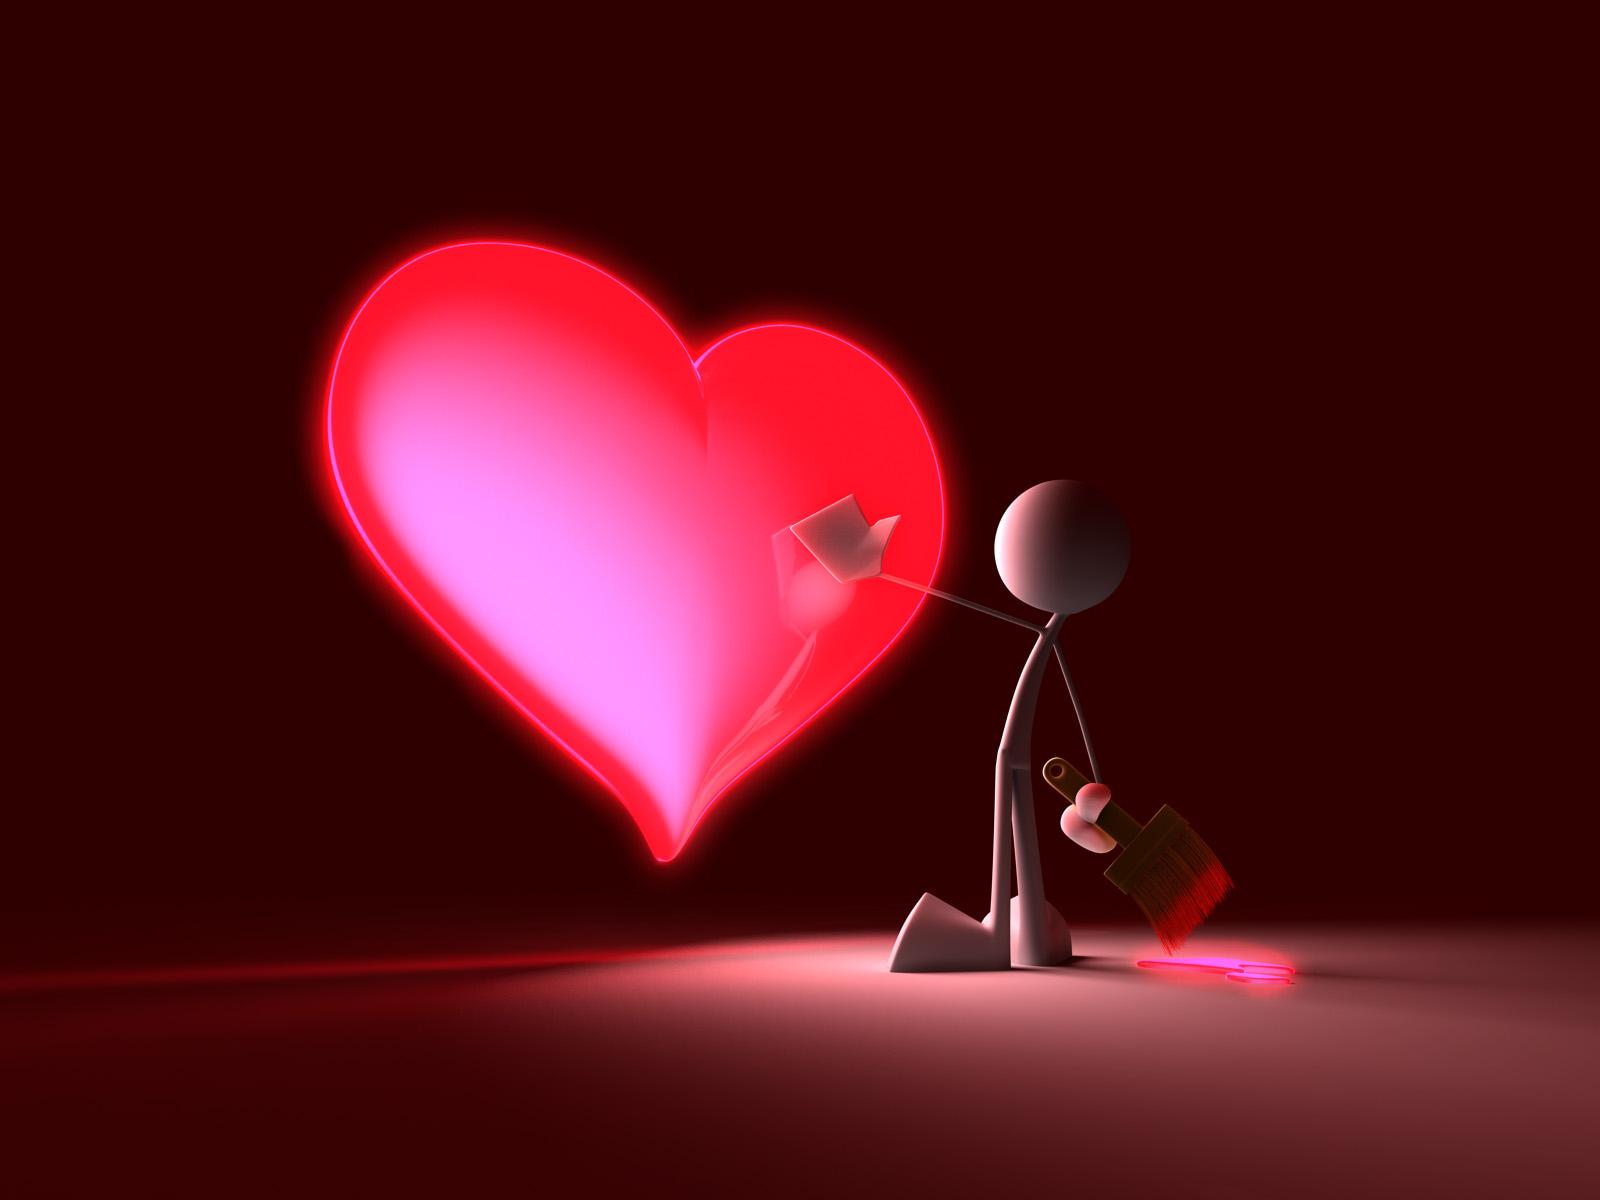 Обои на рабочий стол на тему любви 31 шт